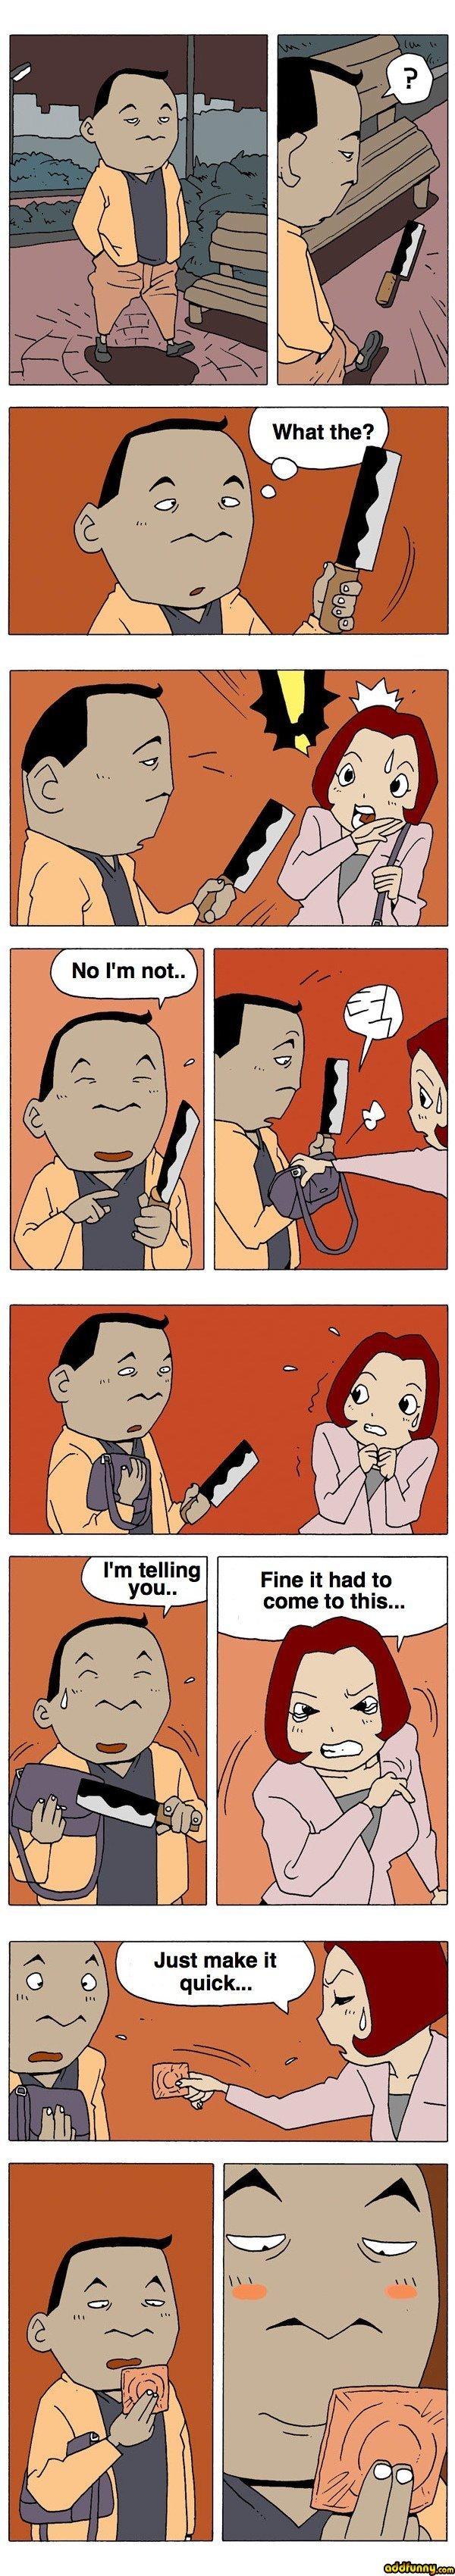 Korean Comic. Not mine, but funny. Korean Comic Not mine but funny